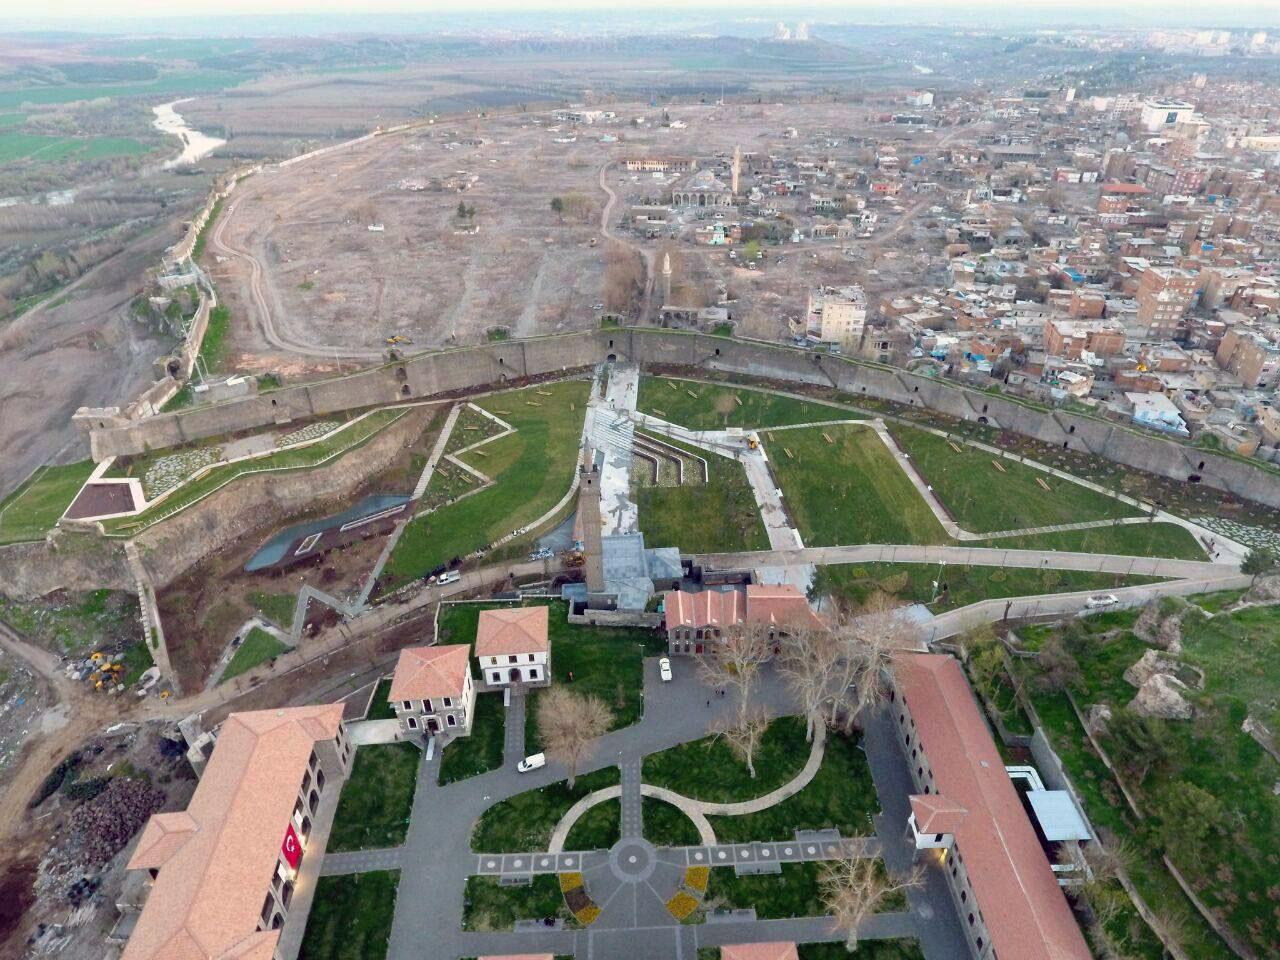 Urbicide sur Diarbakir Turquie photographie aérienne